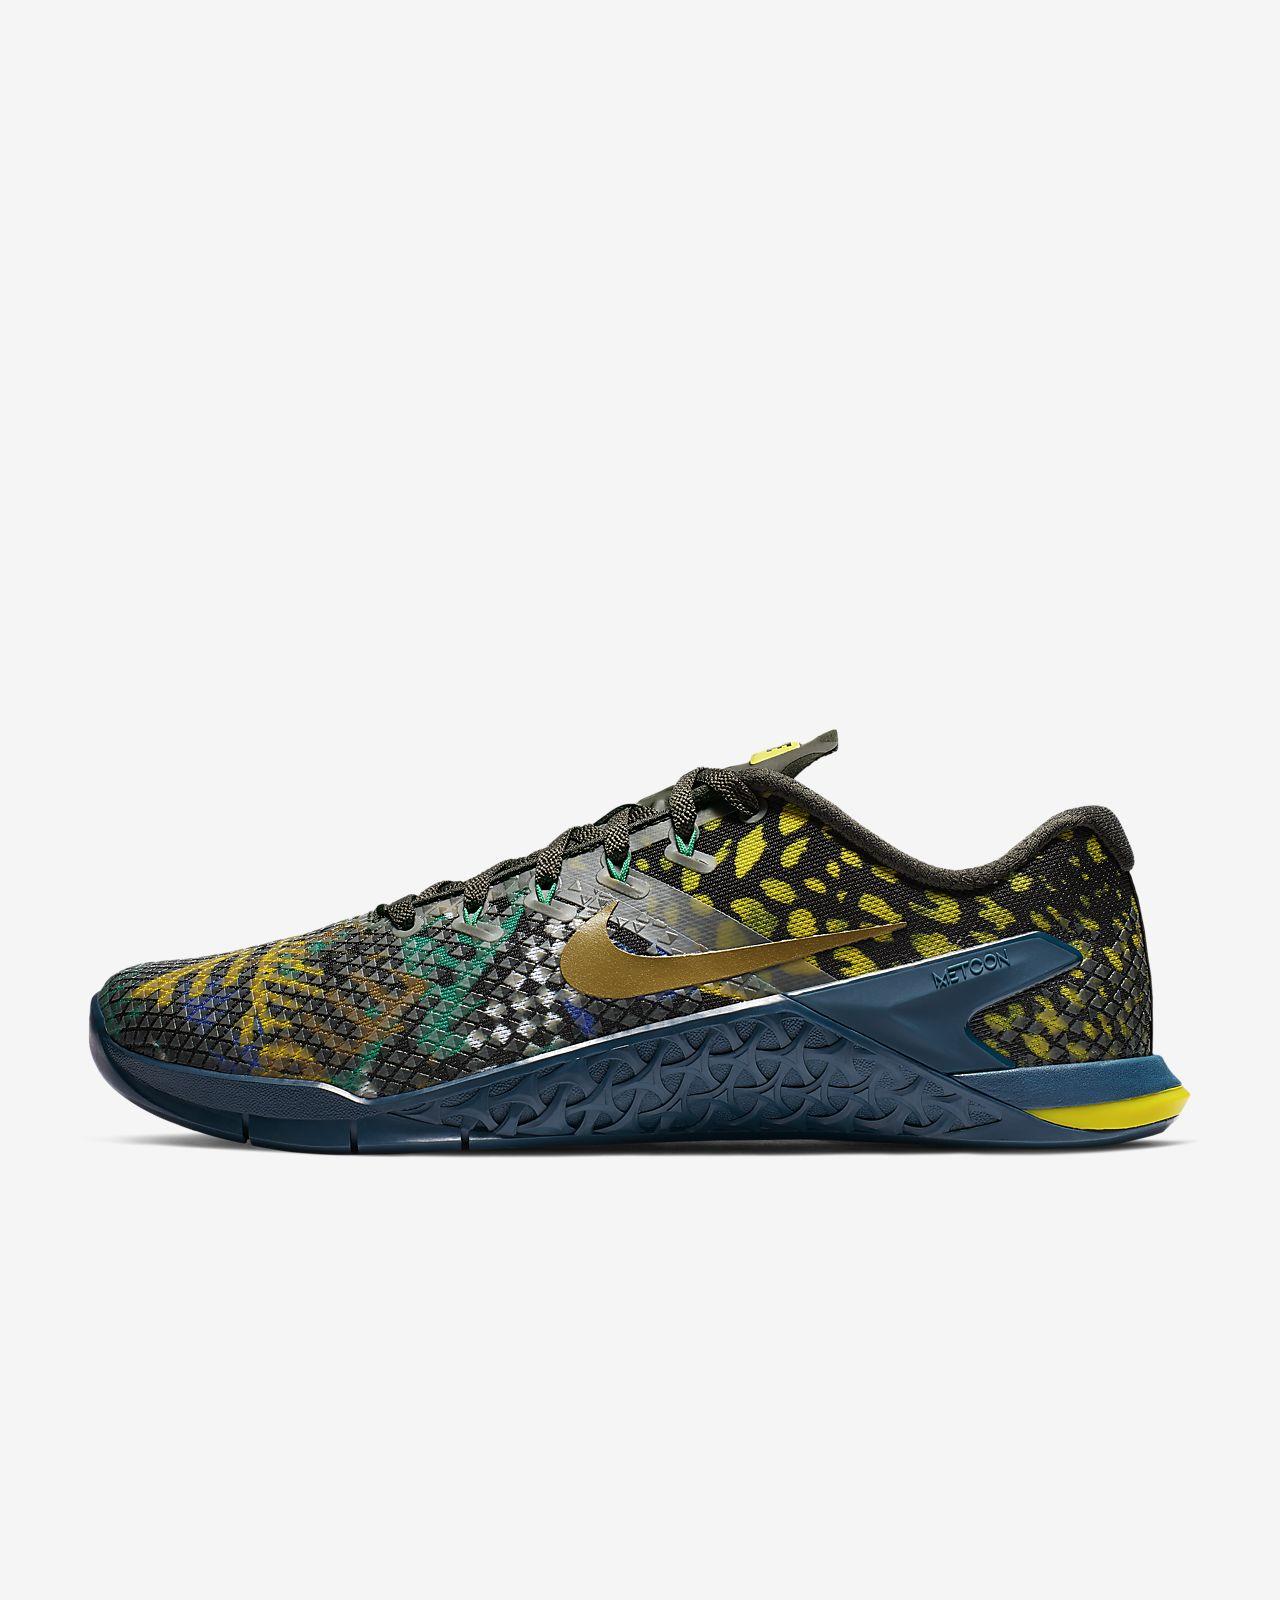 06311541f823 Nike Metcon 4 XD Men s Training Shoe. Nike.com DK